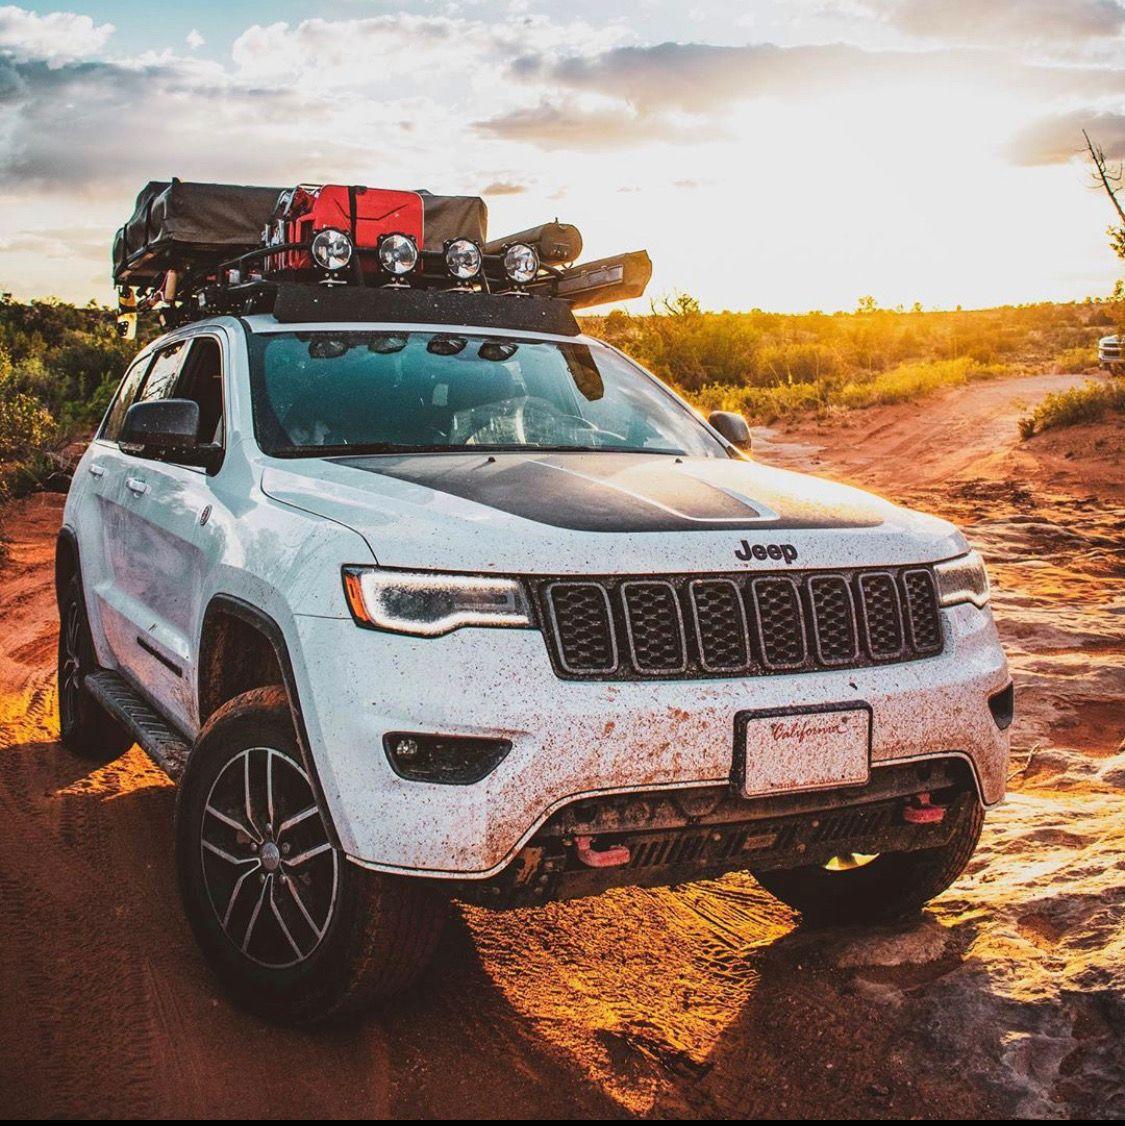 Jeep Parts Gear Accessories